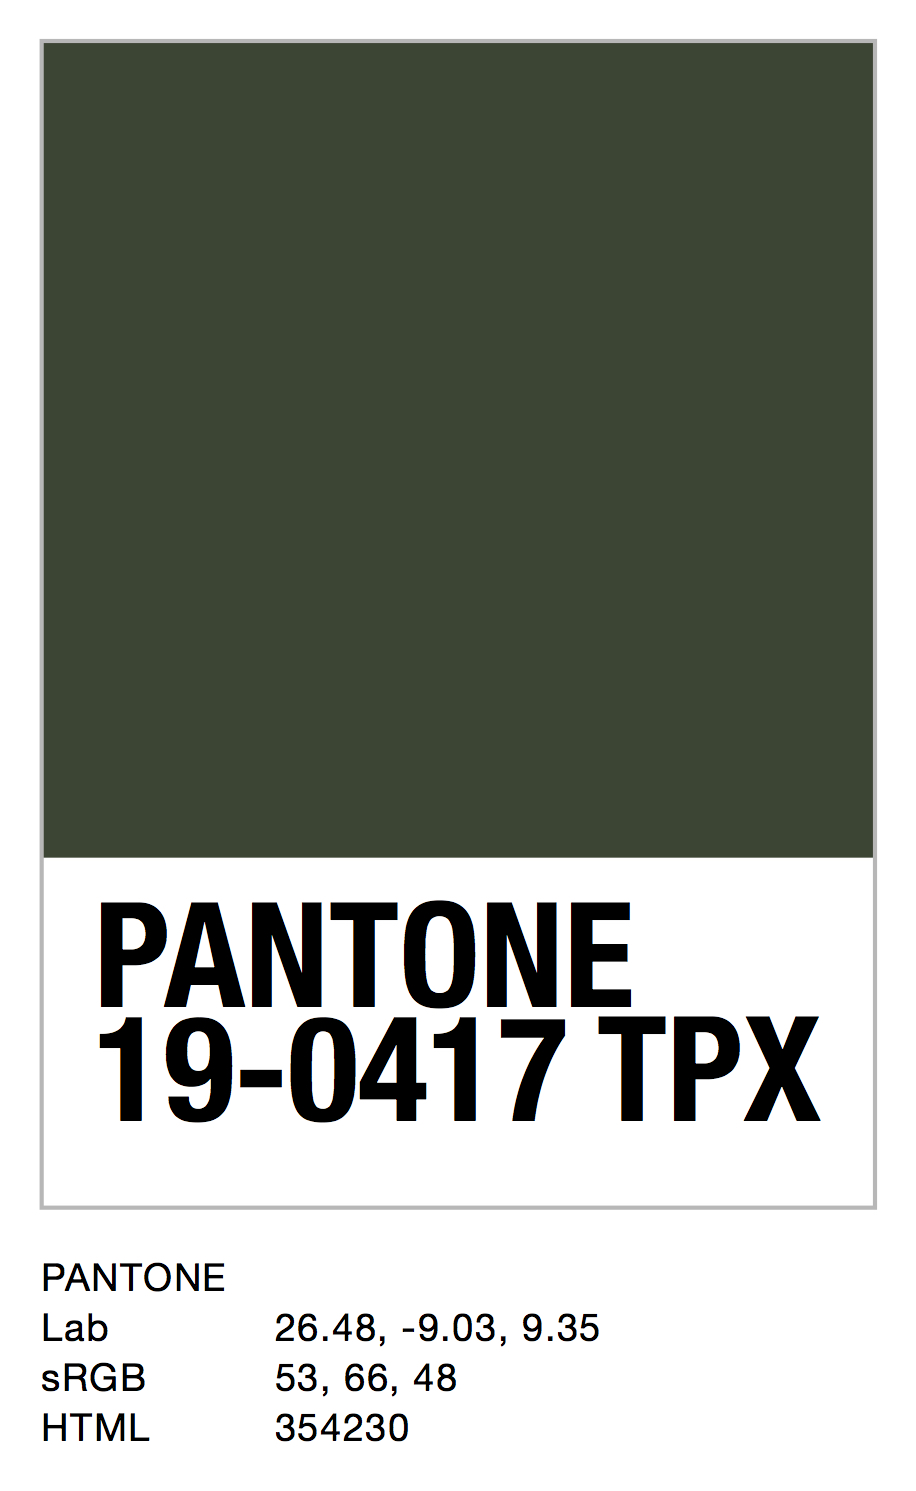 PANTONE 19-0417 TPX.jpg